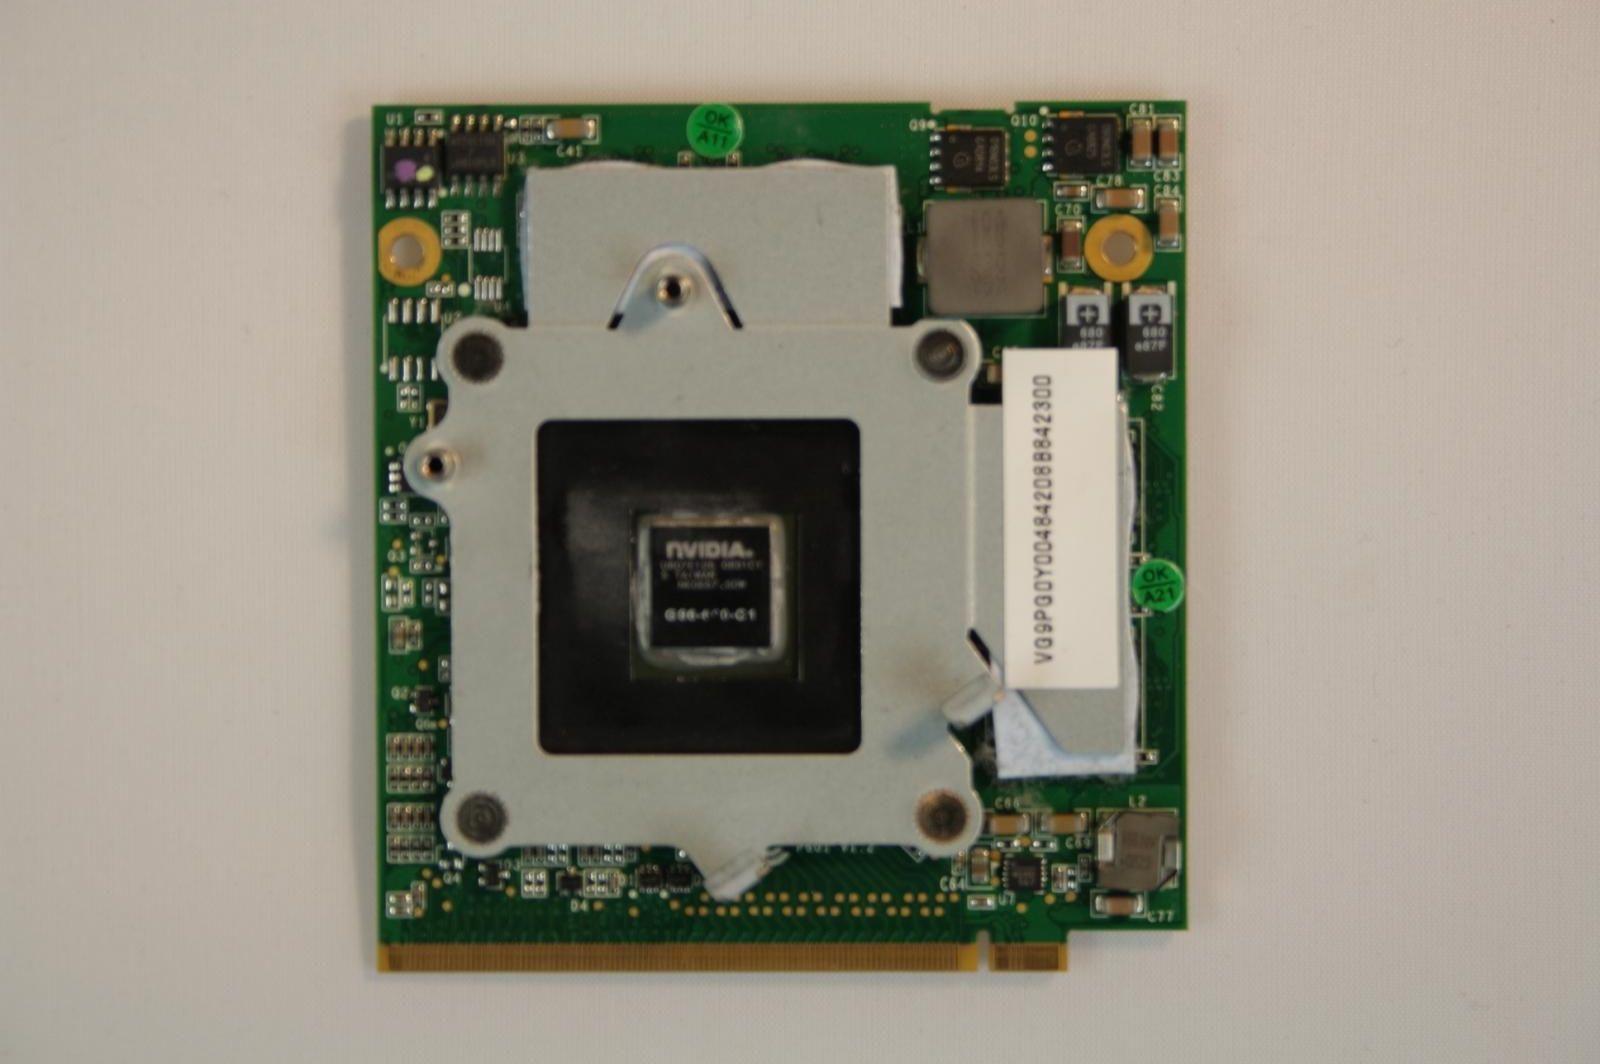 Comfine Fine Computersmore Scanner Barcode Datalogic Qw2100 Linear Imager Quickscan Lite Vga Board 512mb Nvidia Nb9p Ge2